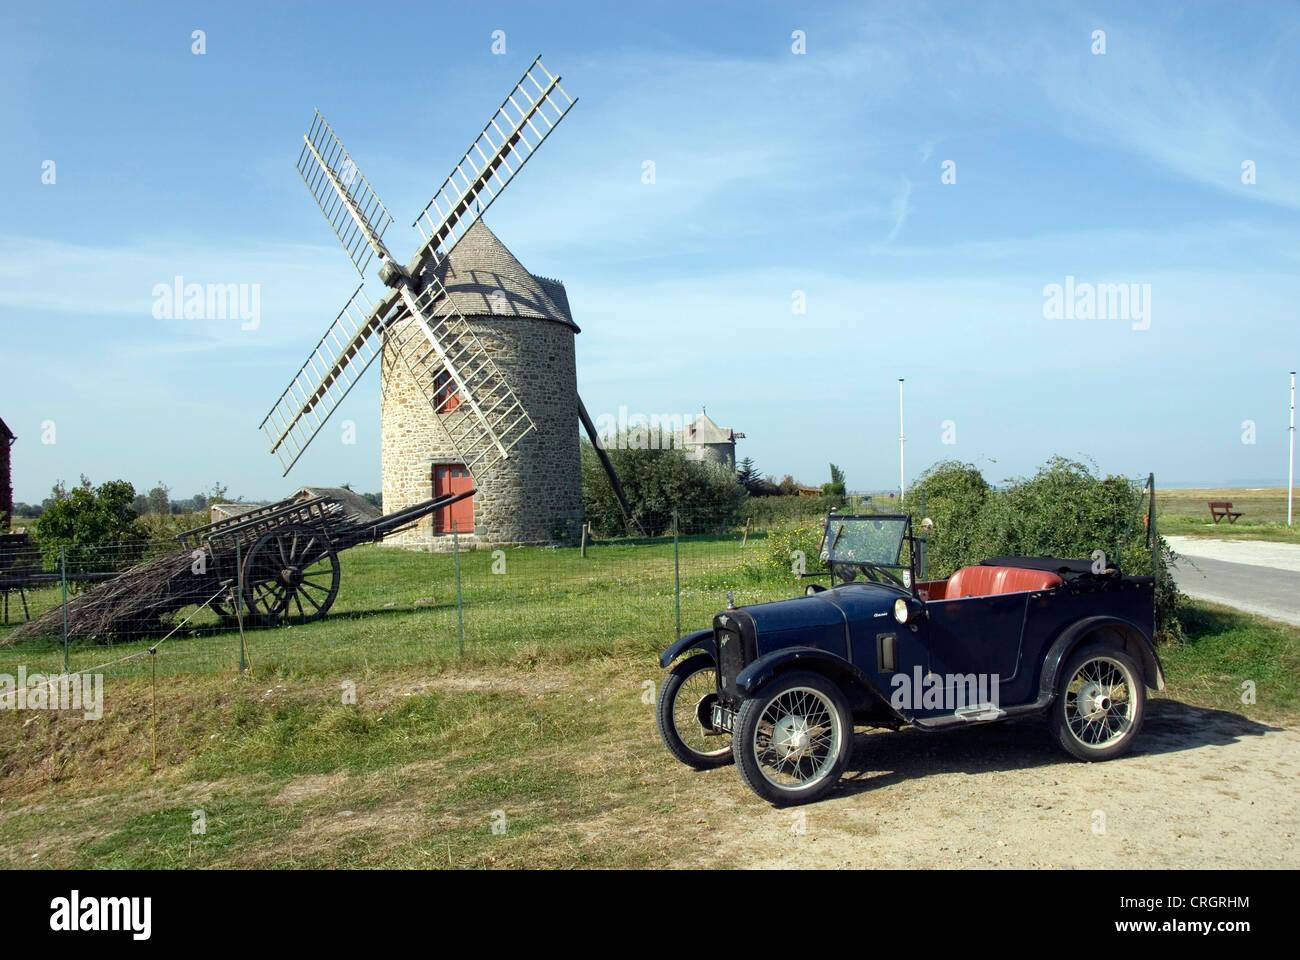 Windmühle und Oldtimer Austin, Frankreich, Bretagne, Cherrueix Stockbild